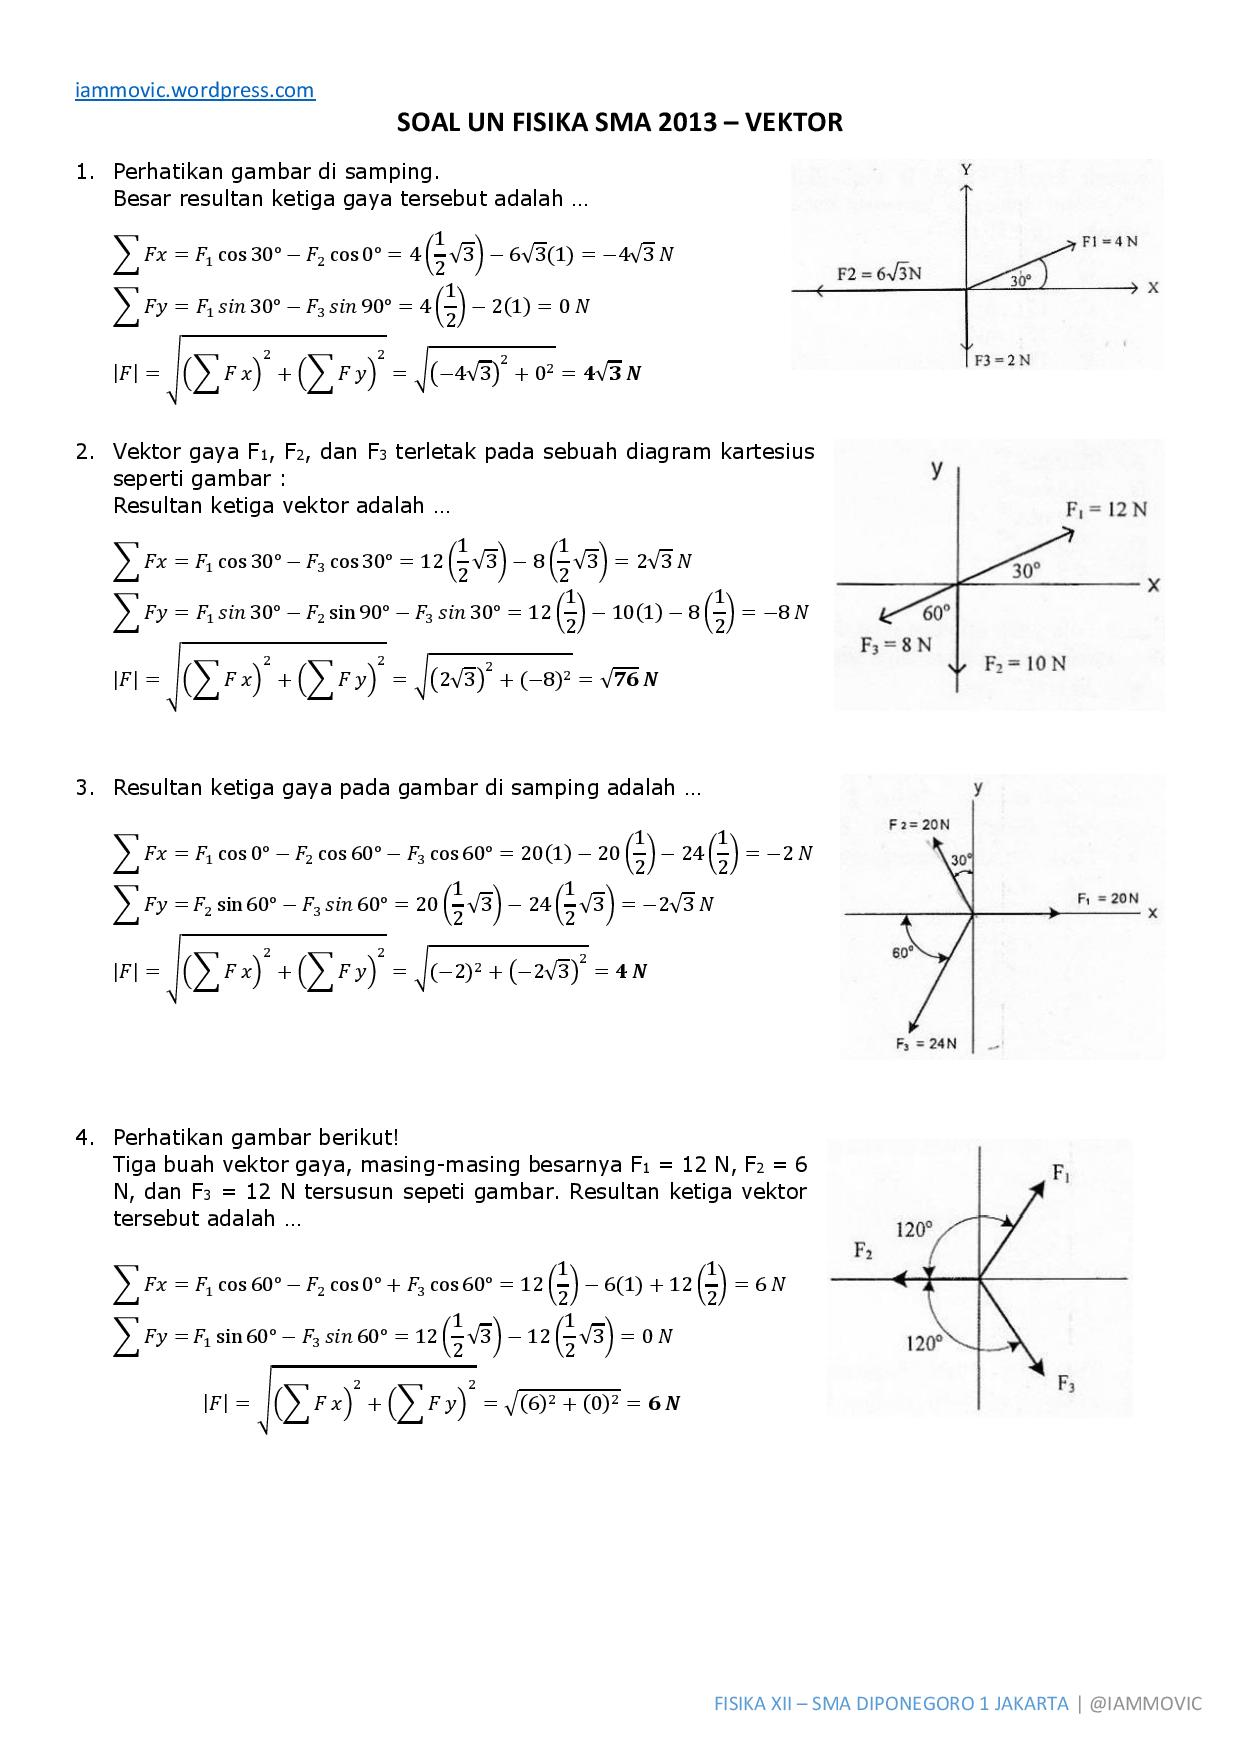 Pembahasan Soal Un Fisika Sma 2013 Vektor Iammovic